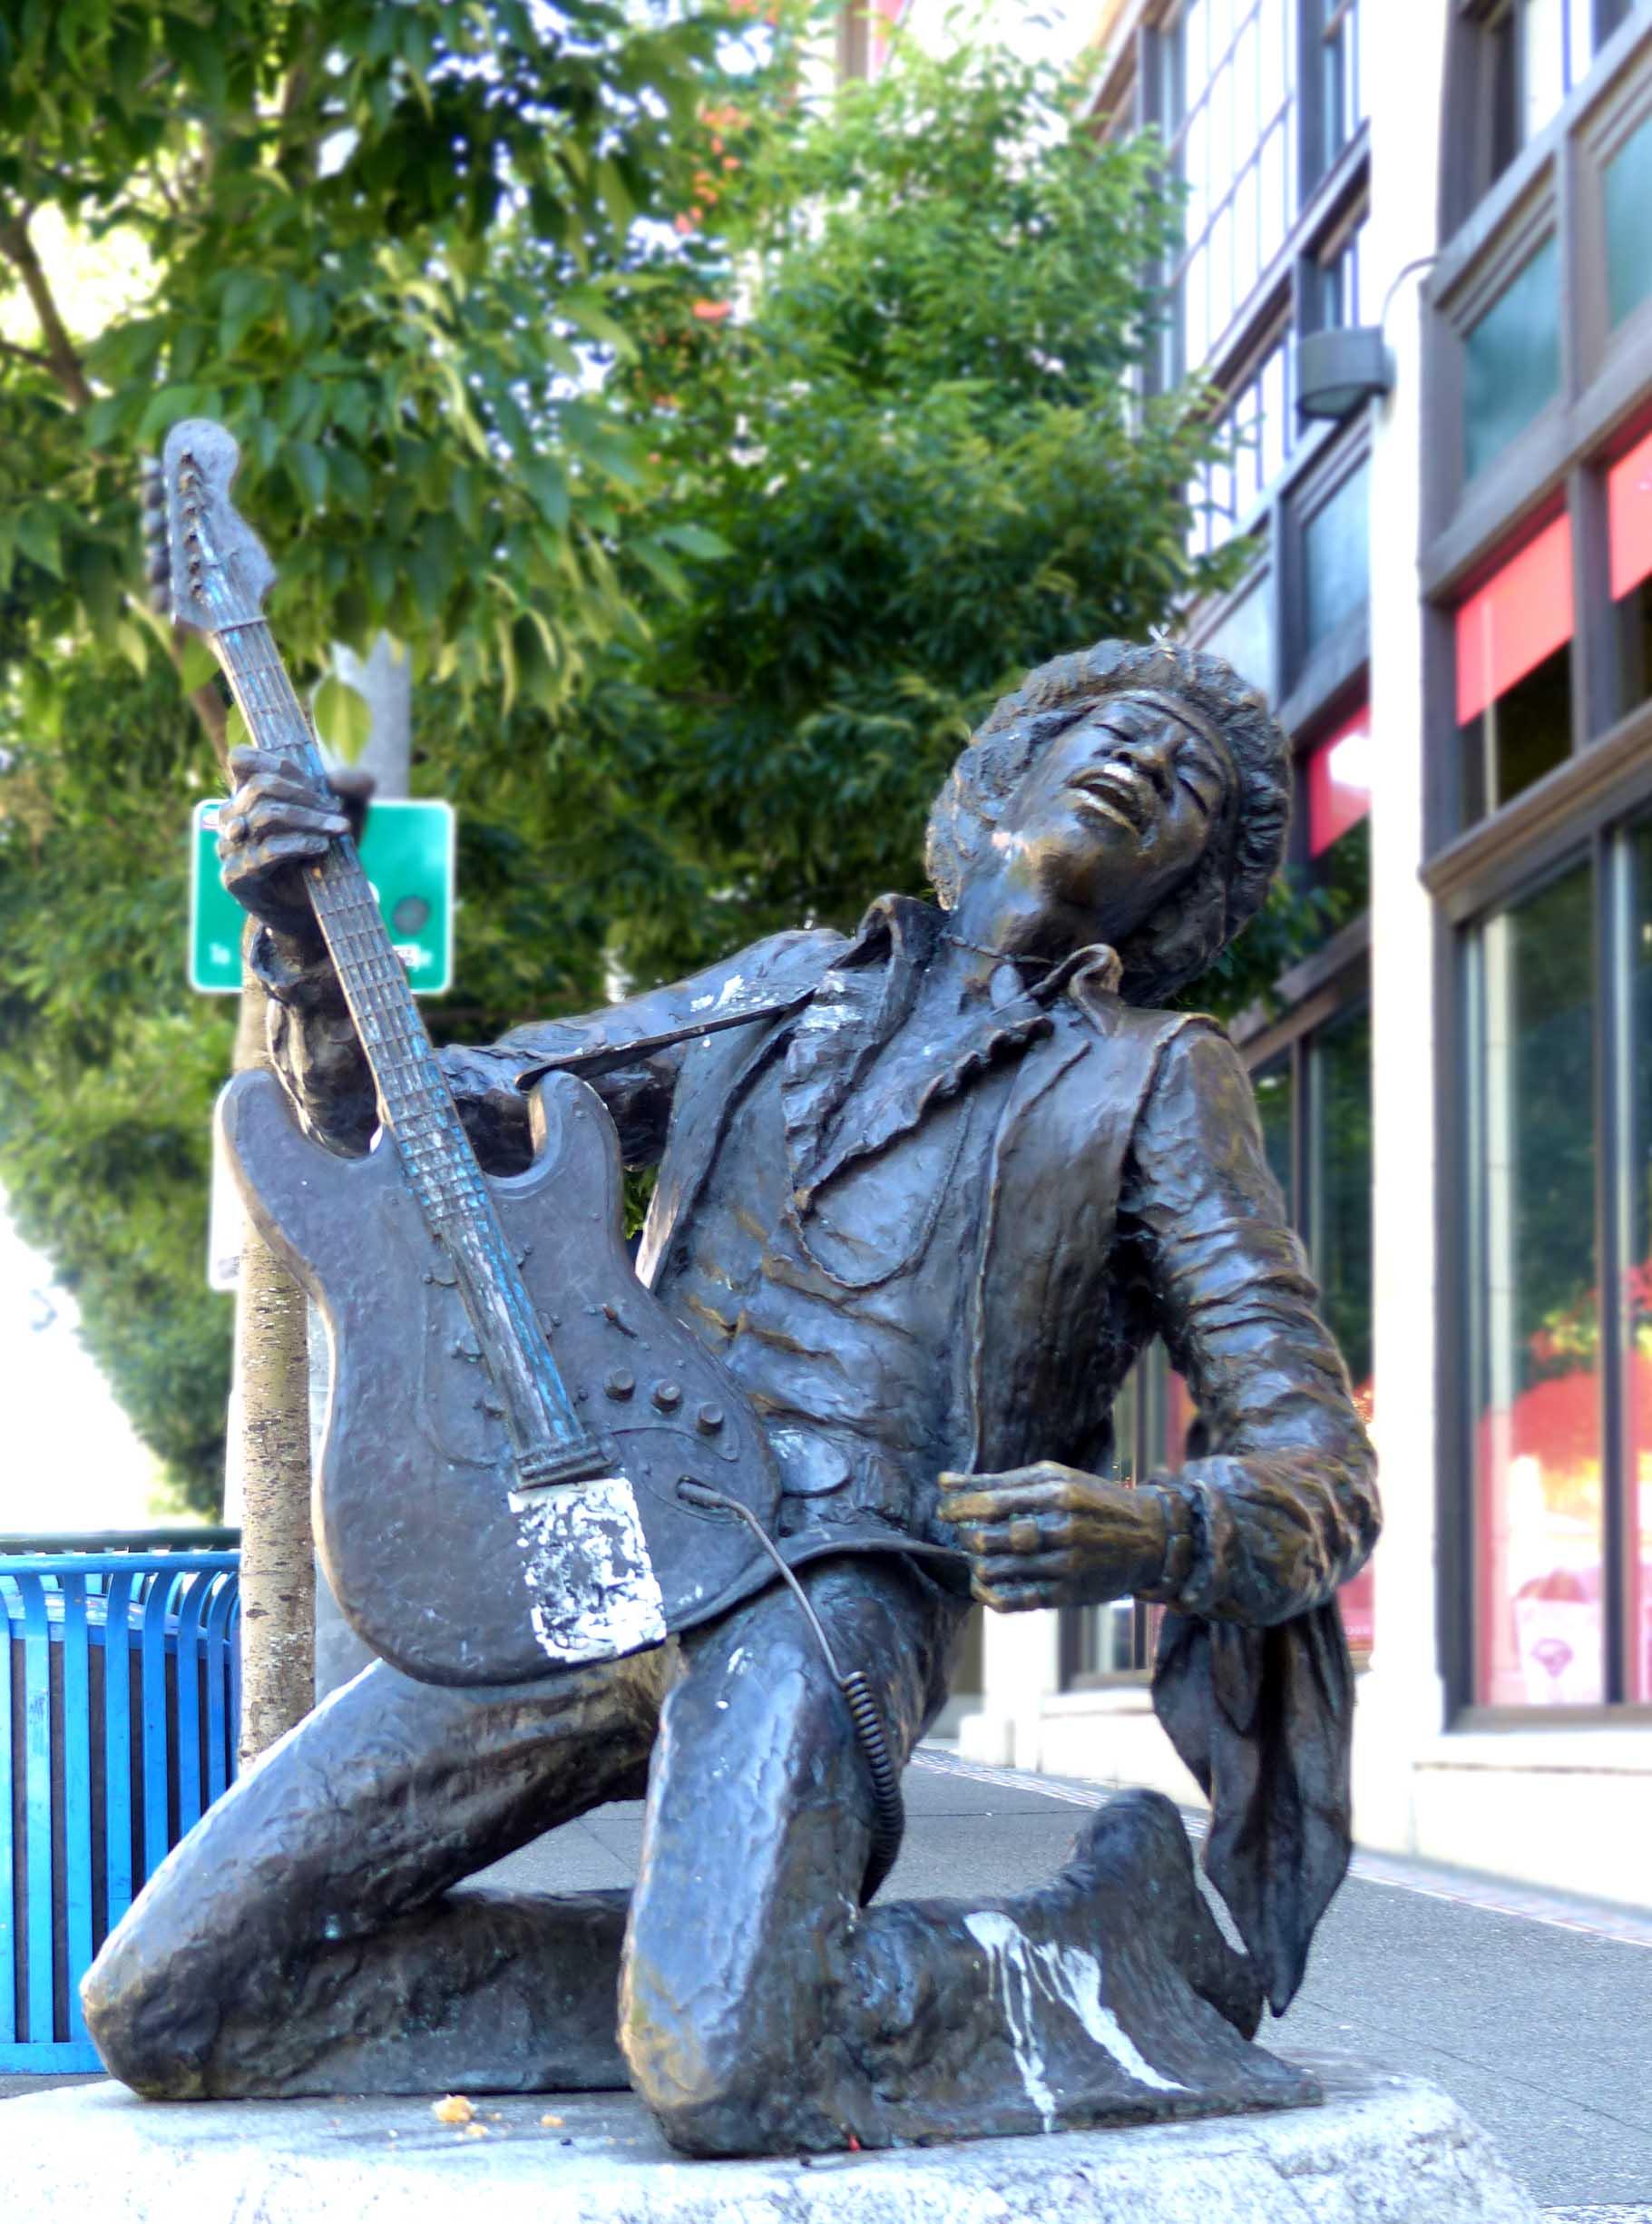 Metal sculpture of man playing electric guitar